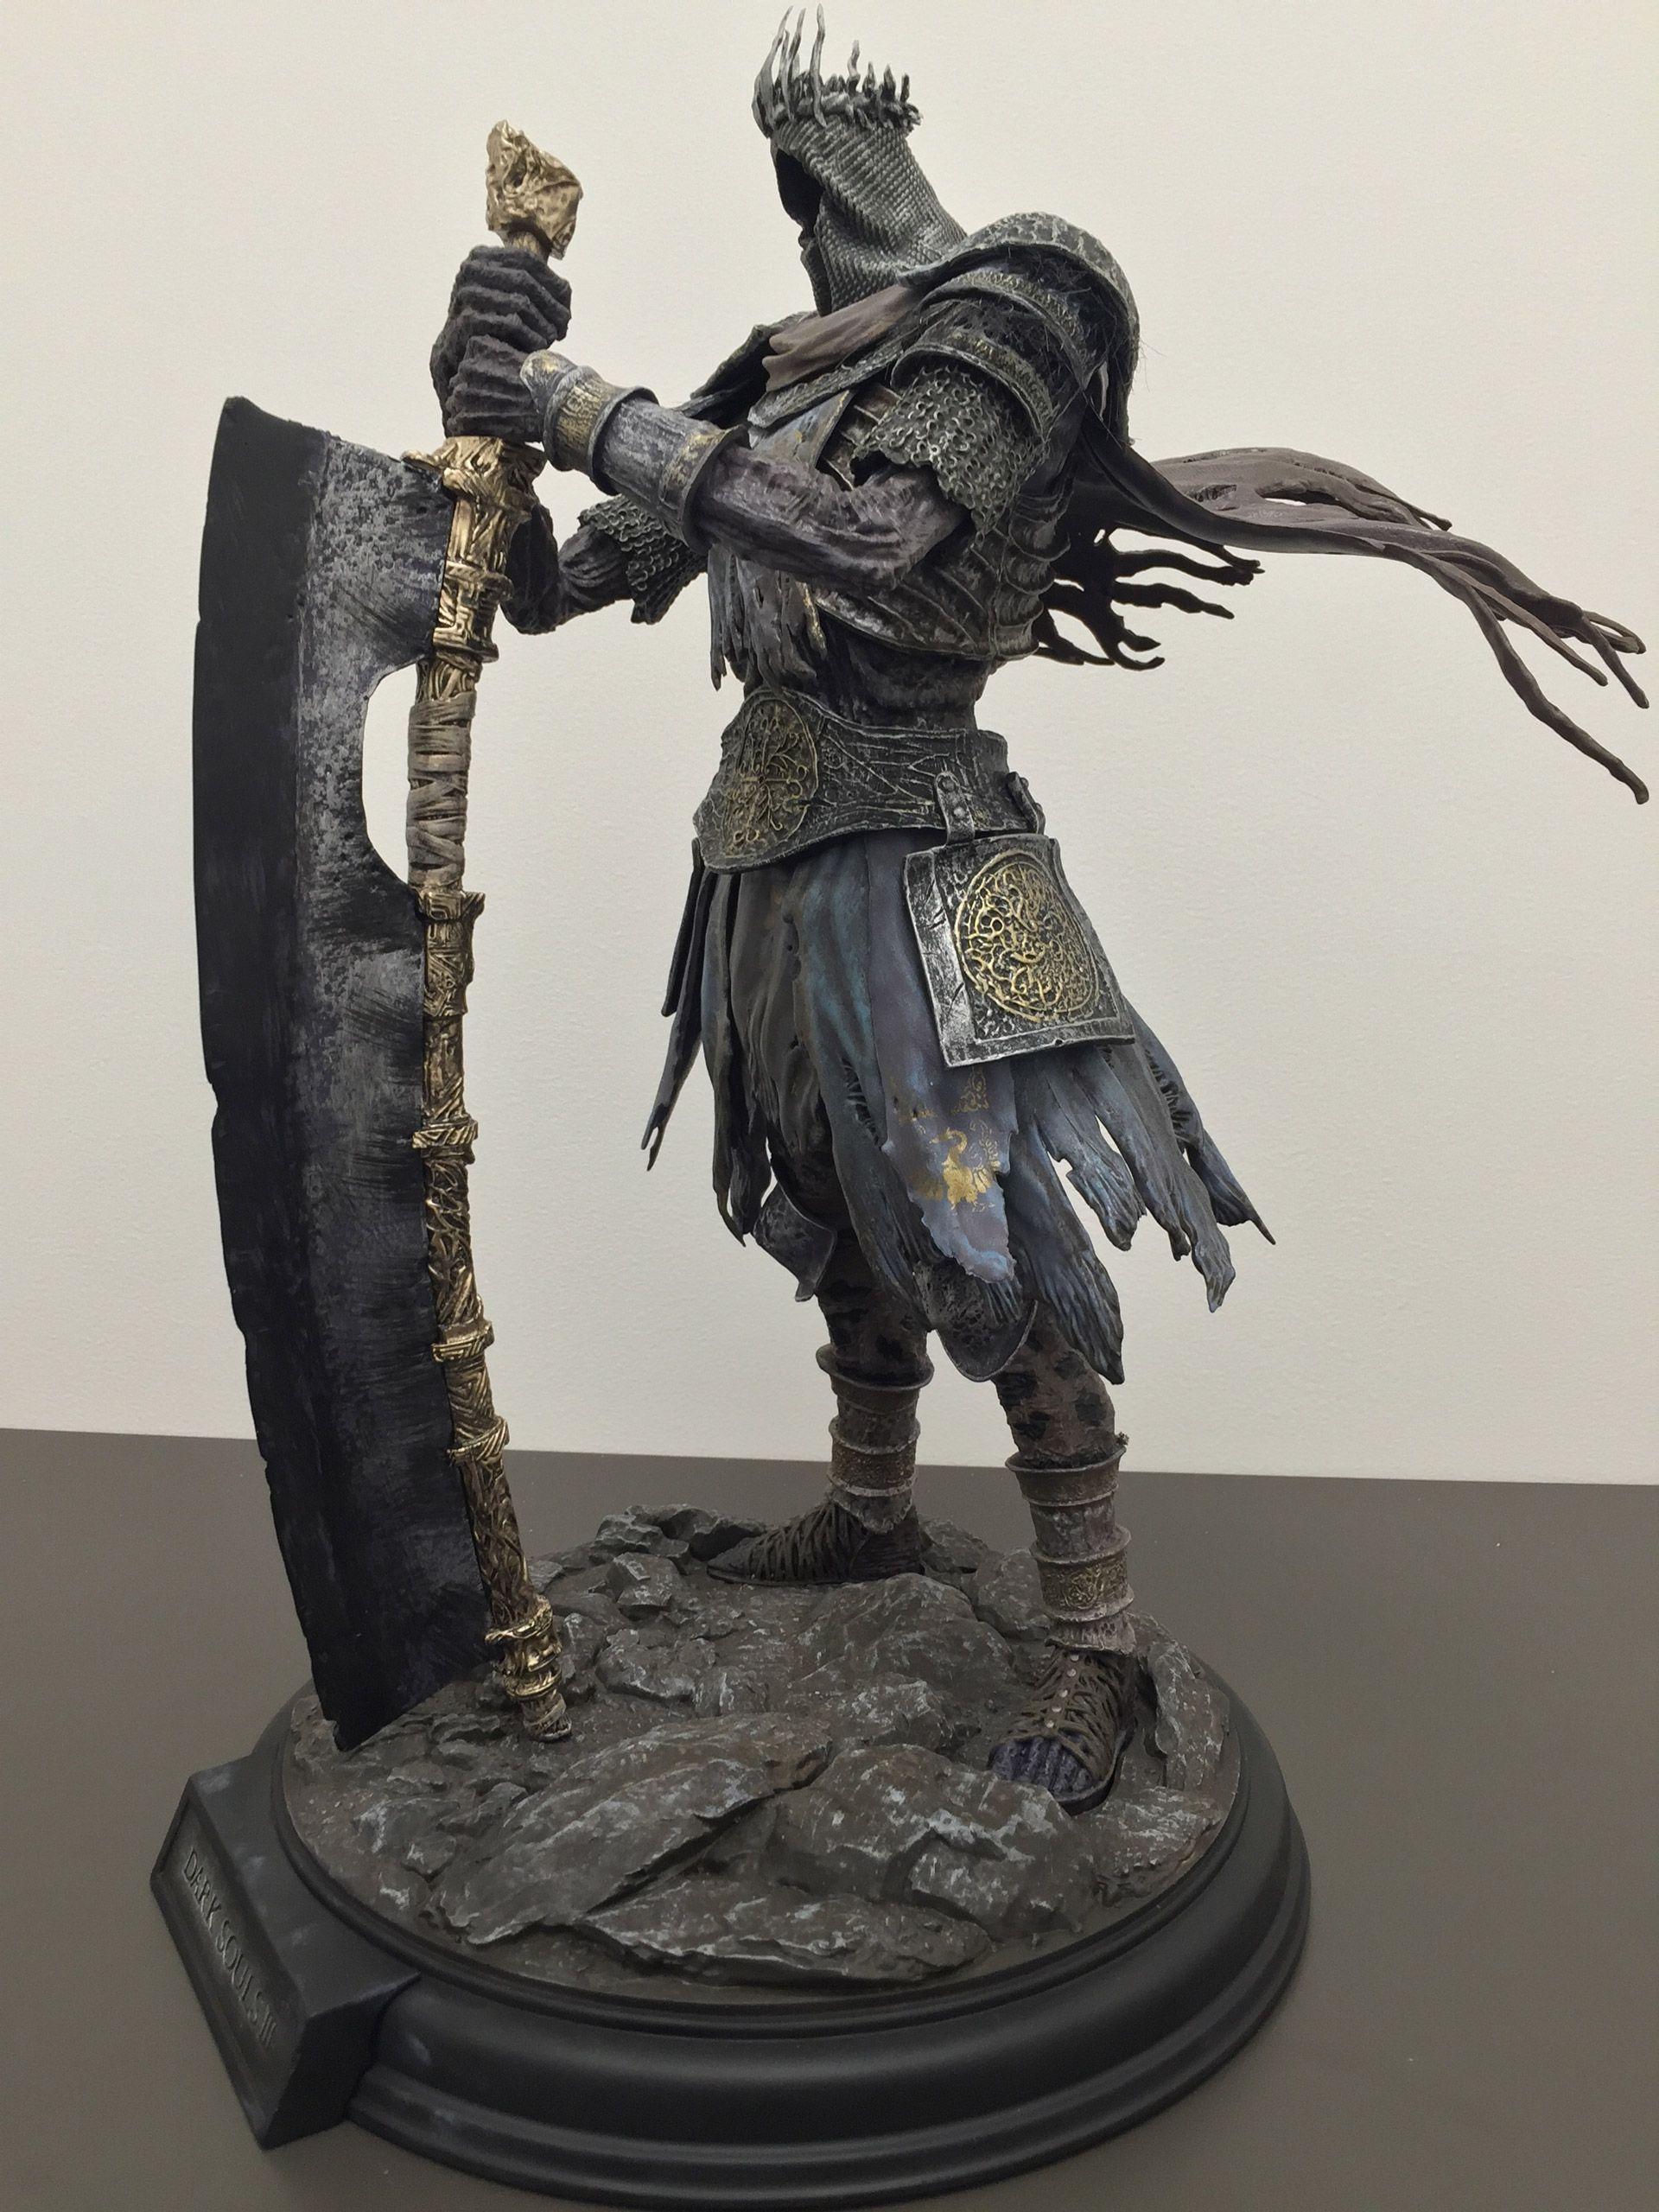 Dark souls iii lord of cinder statue bandai namco store